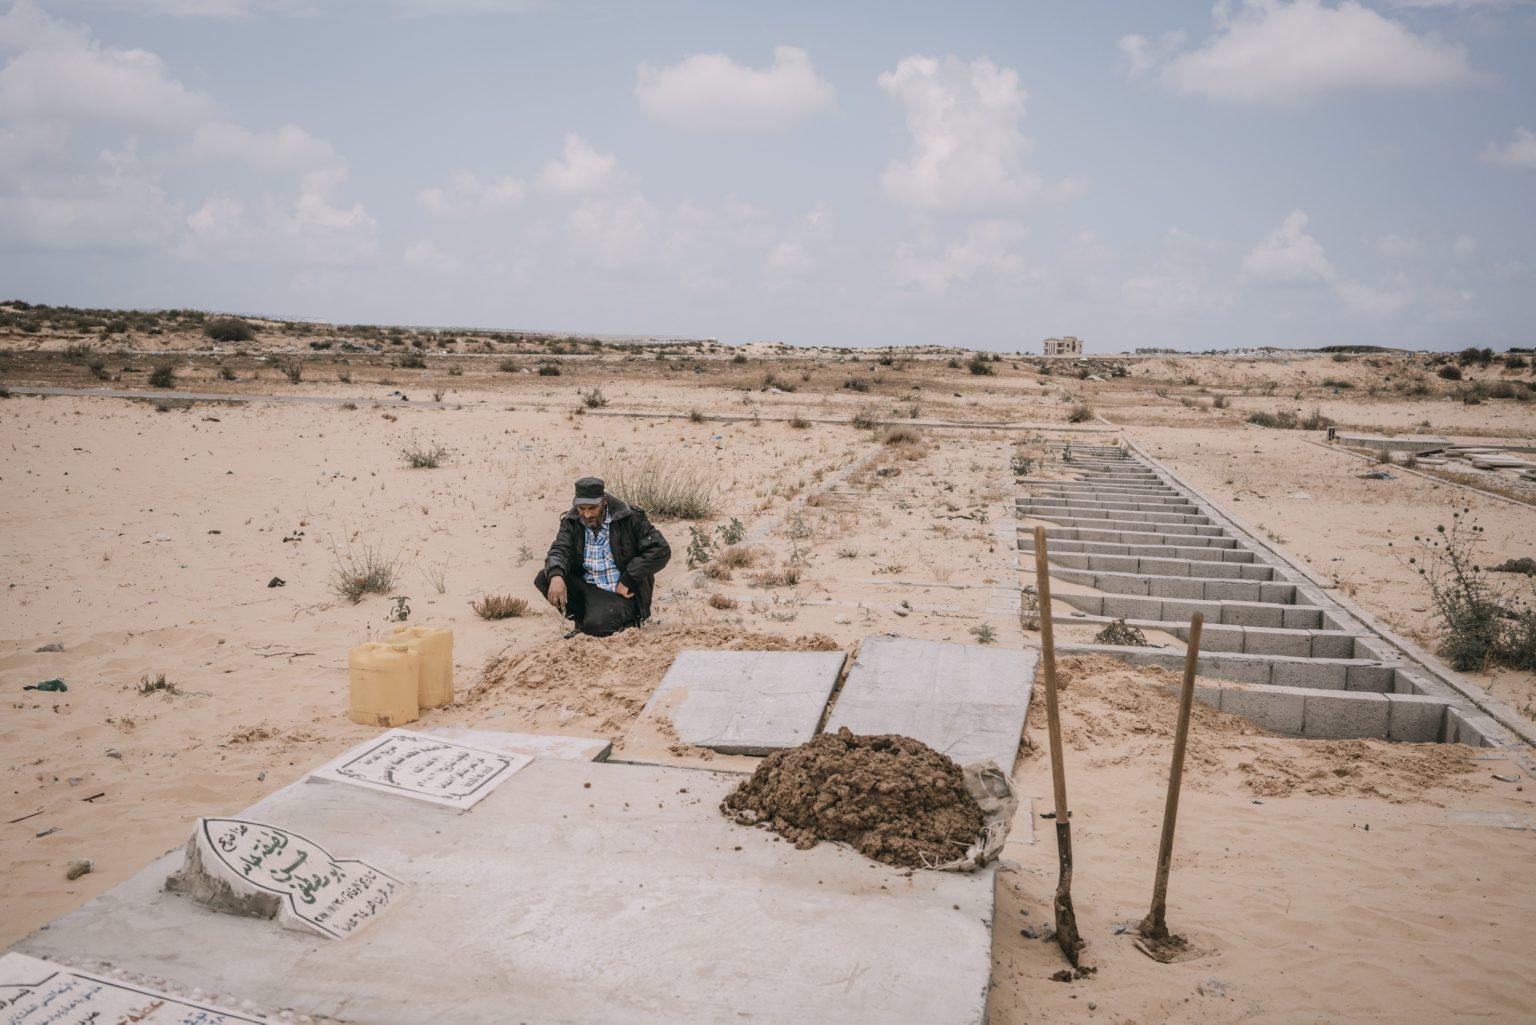 Khan Younis, Gaza Strip, May 2018 - A man waits at the cementery the arrival of the body of 40 year-old Palestinian Jaber Abu Mustafa, killed at the Israel-Gaza border during the protests. >< Khan Younis, Striscia di Gaza, maggio 2018 - Un uomo aspetta l'arrivo del corpo di Jaber Abu Mustafa, un uomo palestinese di 40 anni, ucciso durante le proteste lungo il confine tra Gaza e Israele.